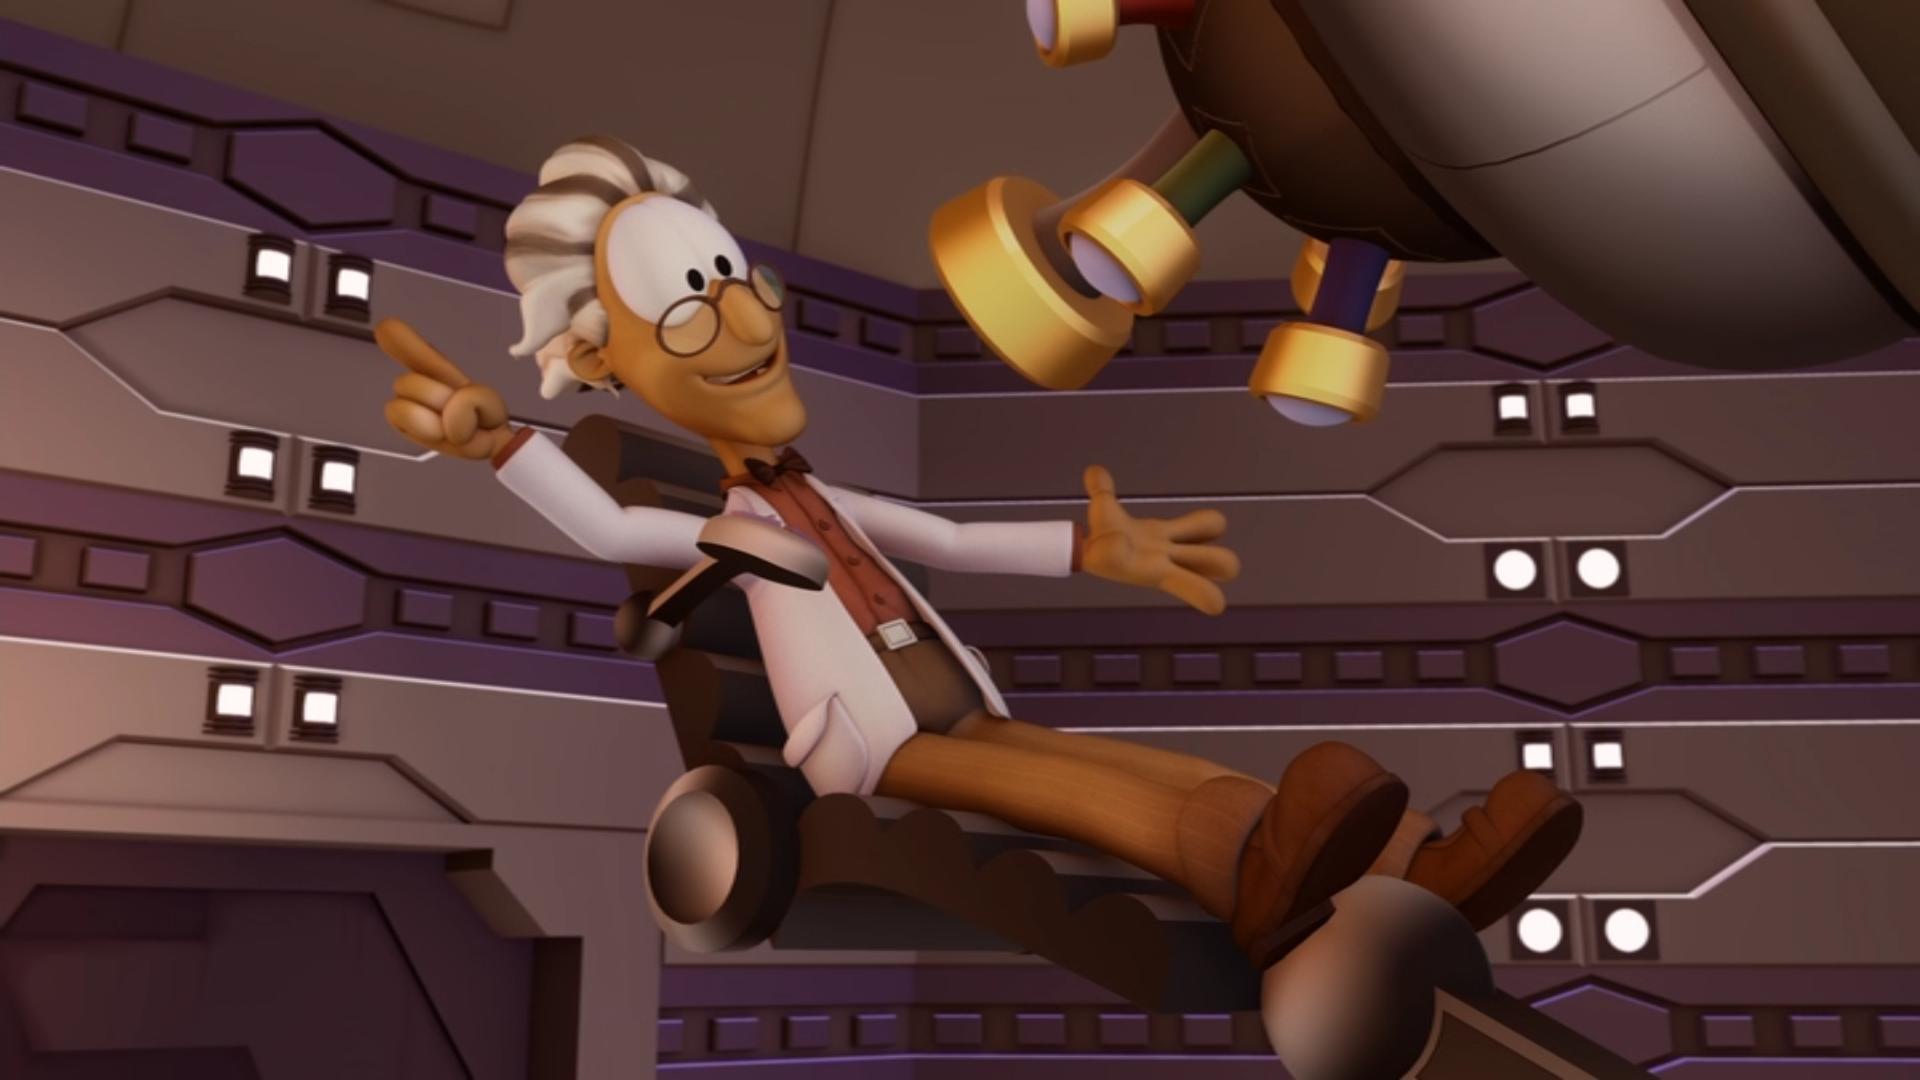 Professor Bonkers